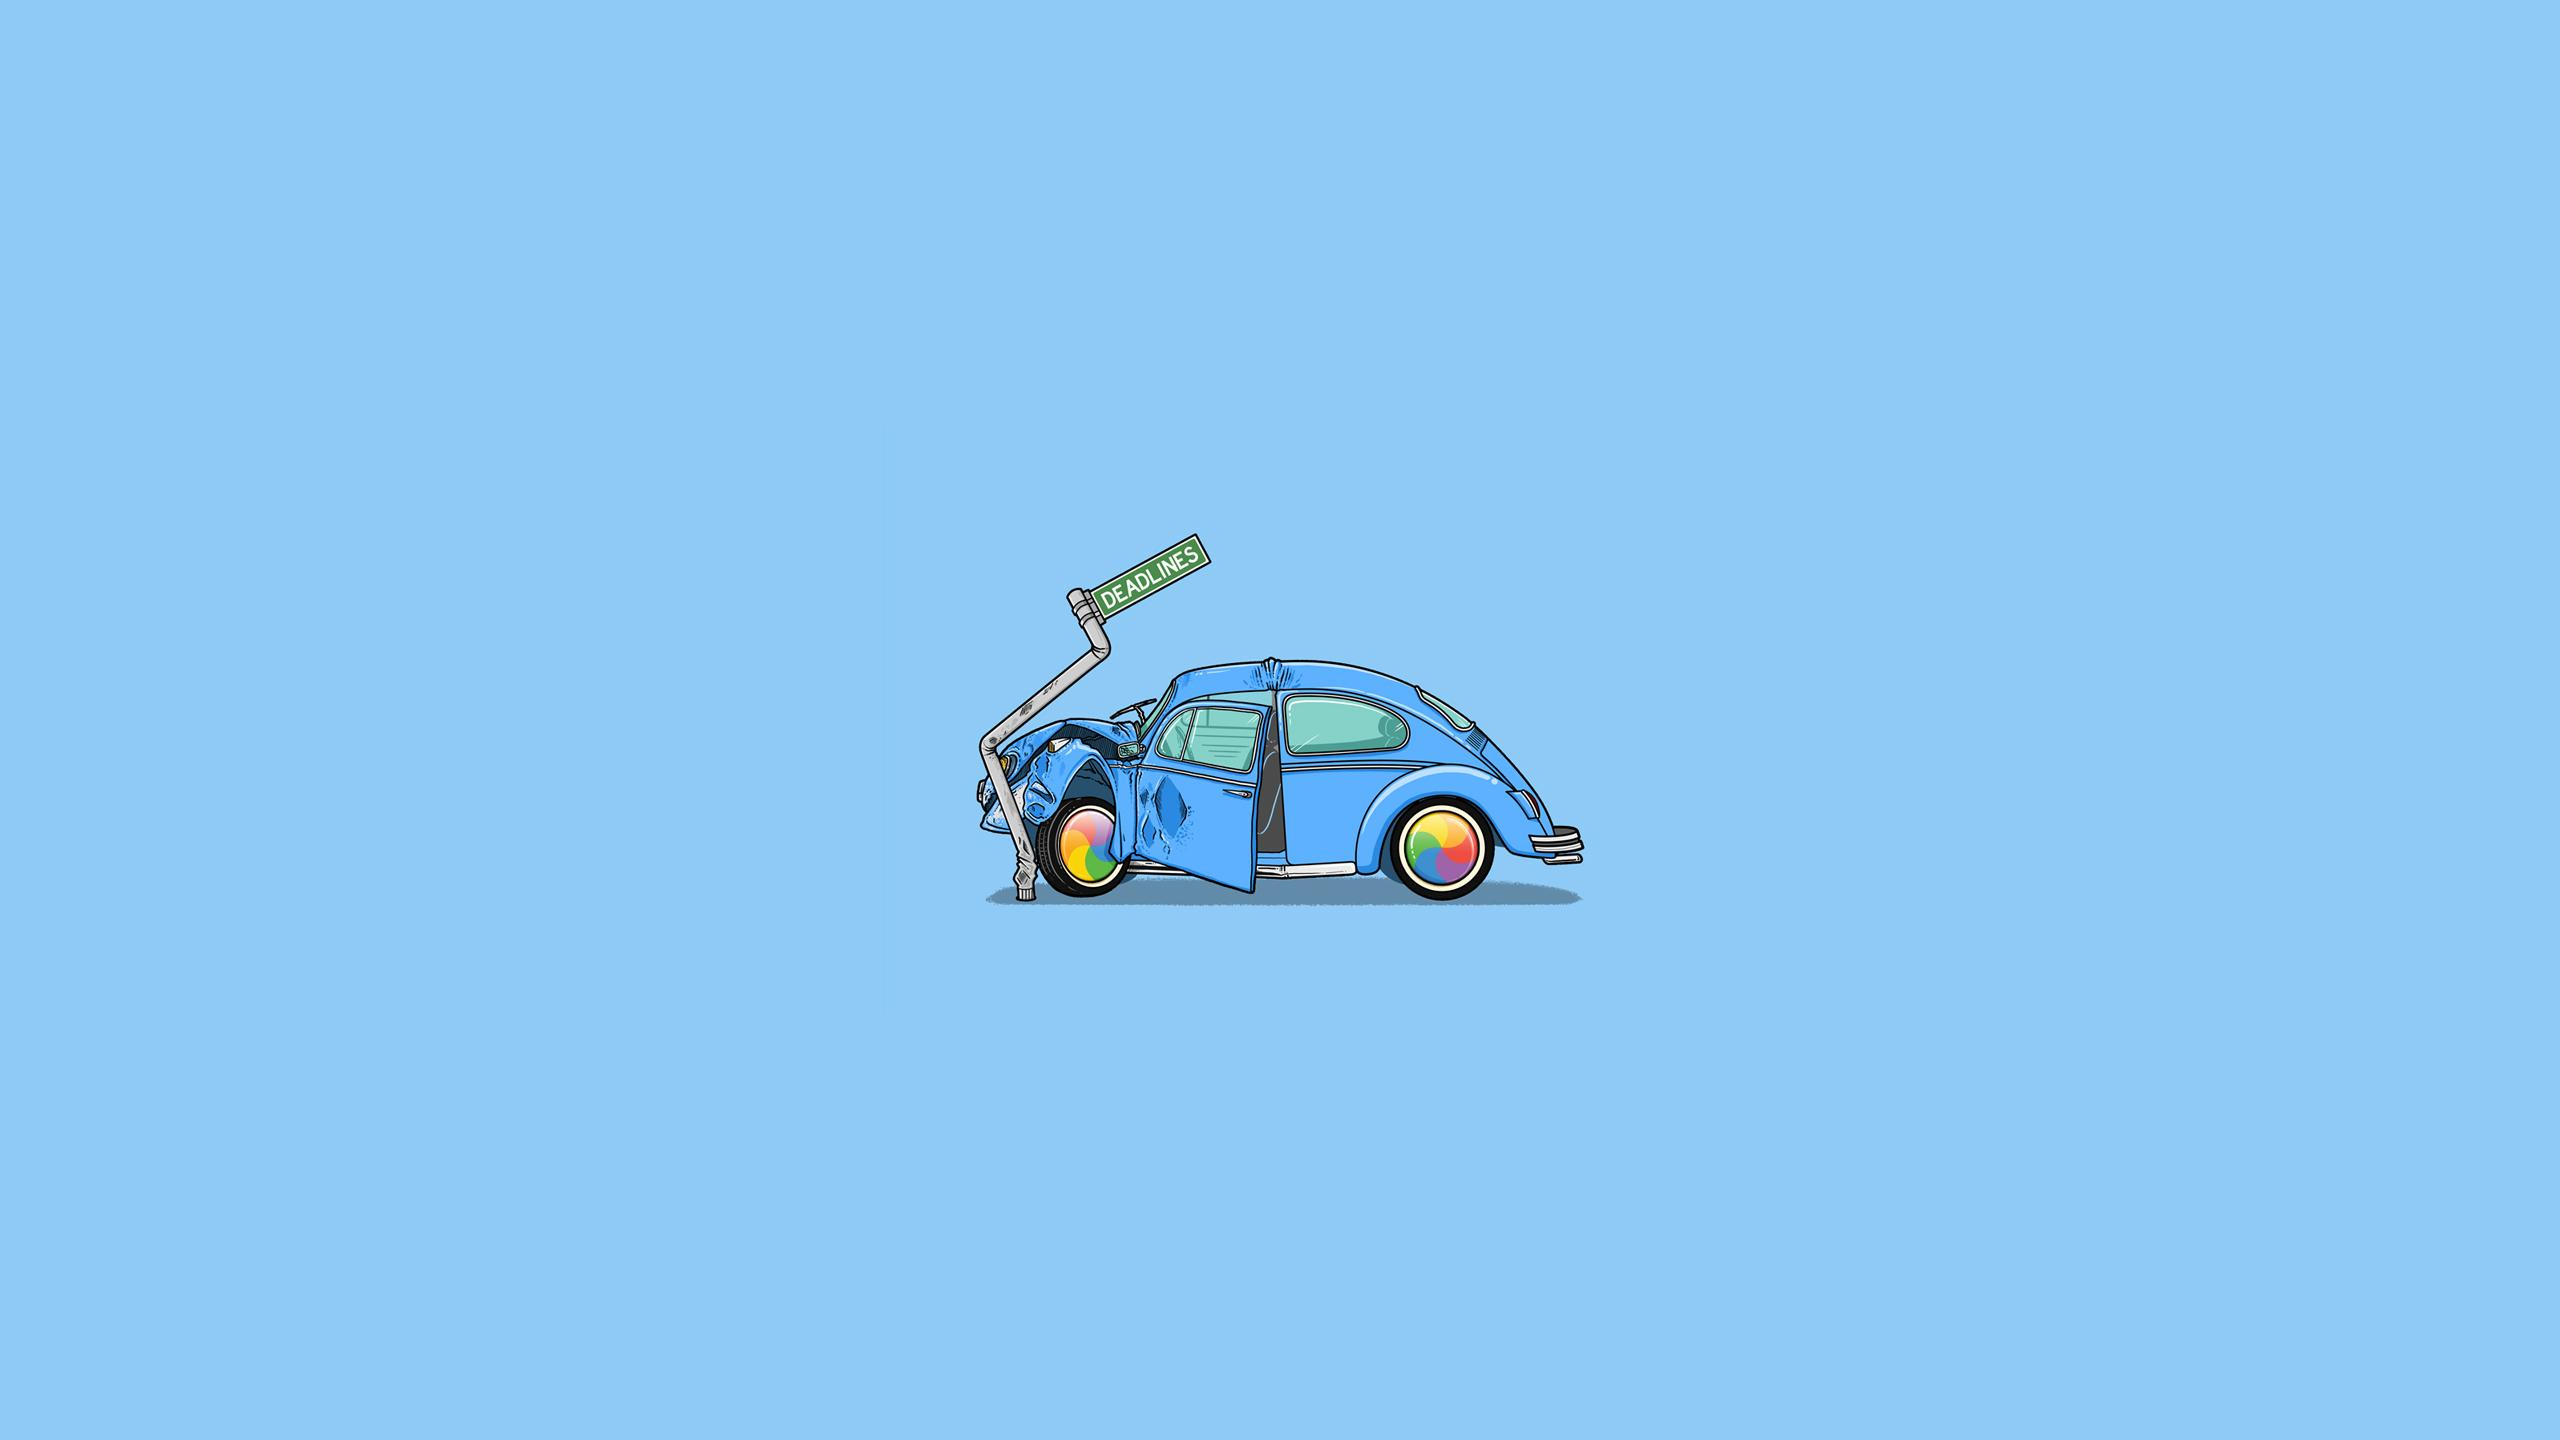 crash car minimalism, hd artist, 4k wallpapers, images, backgrounds